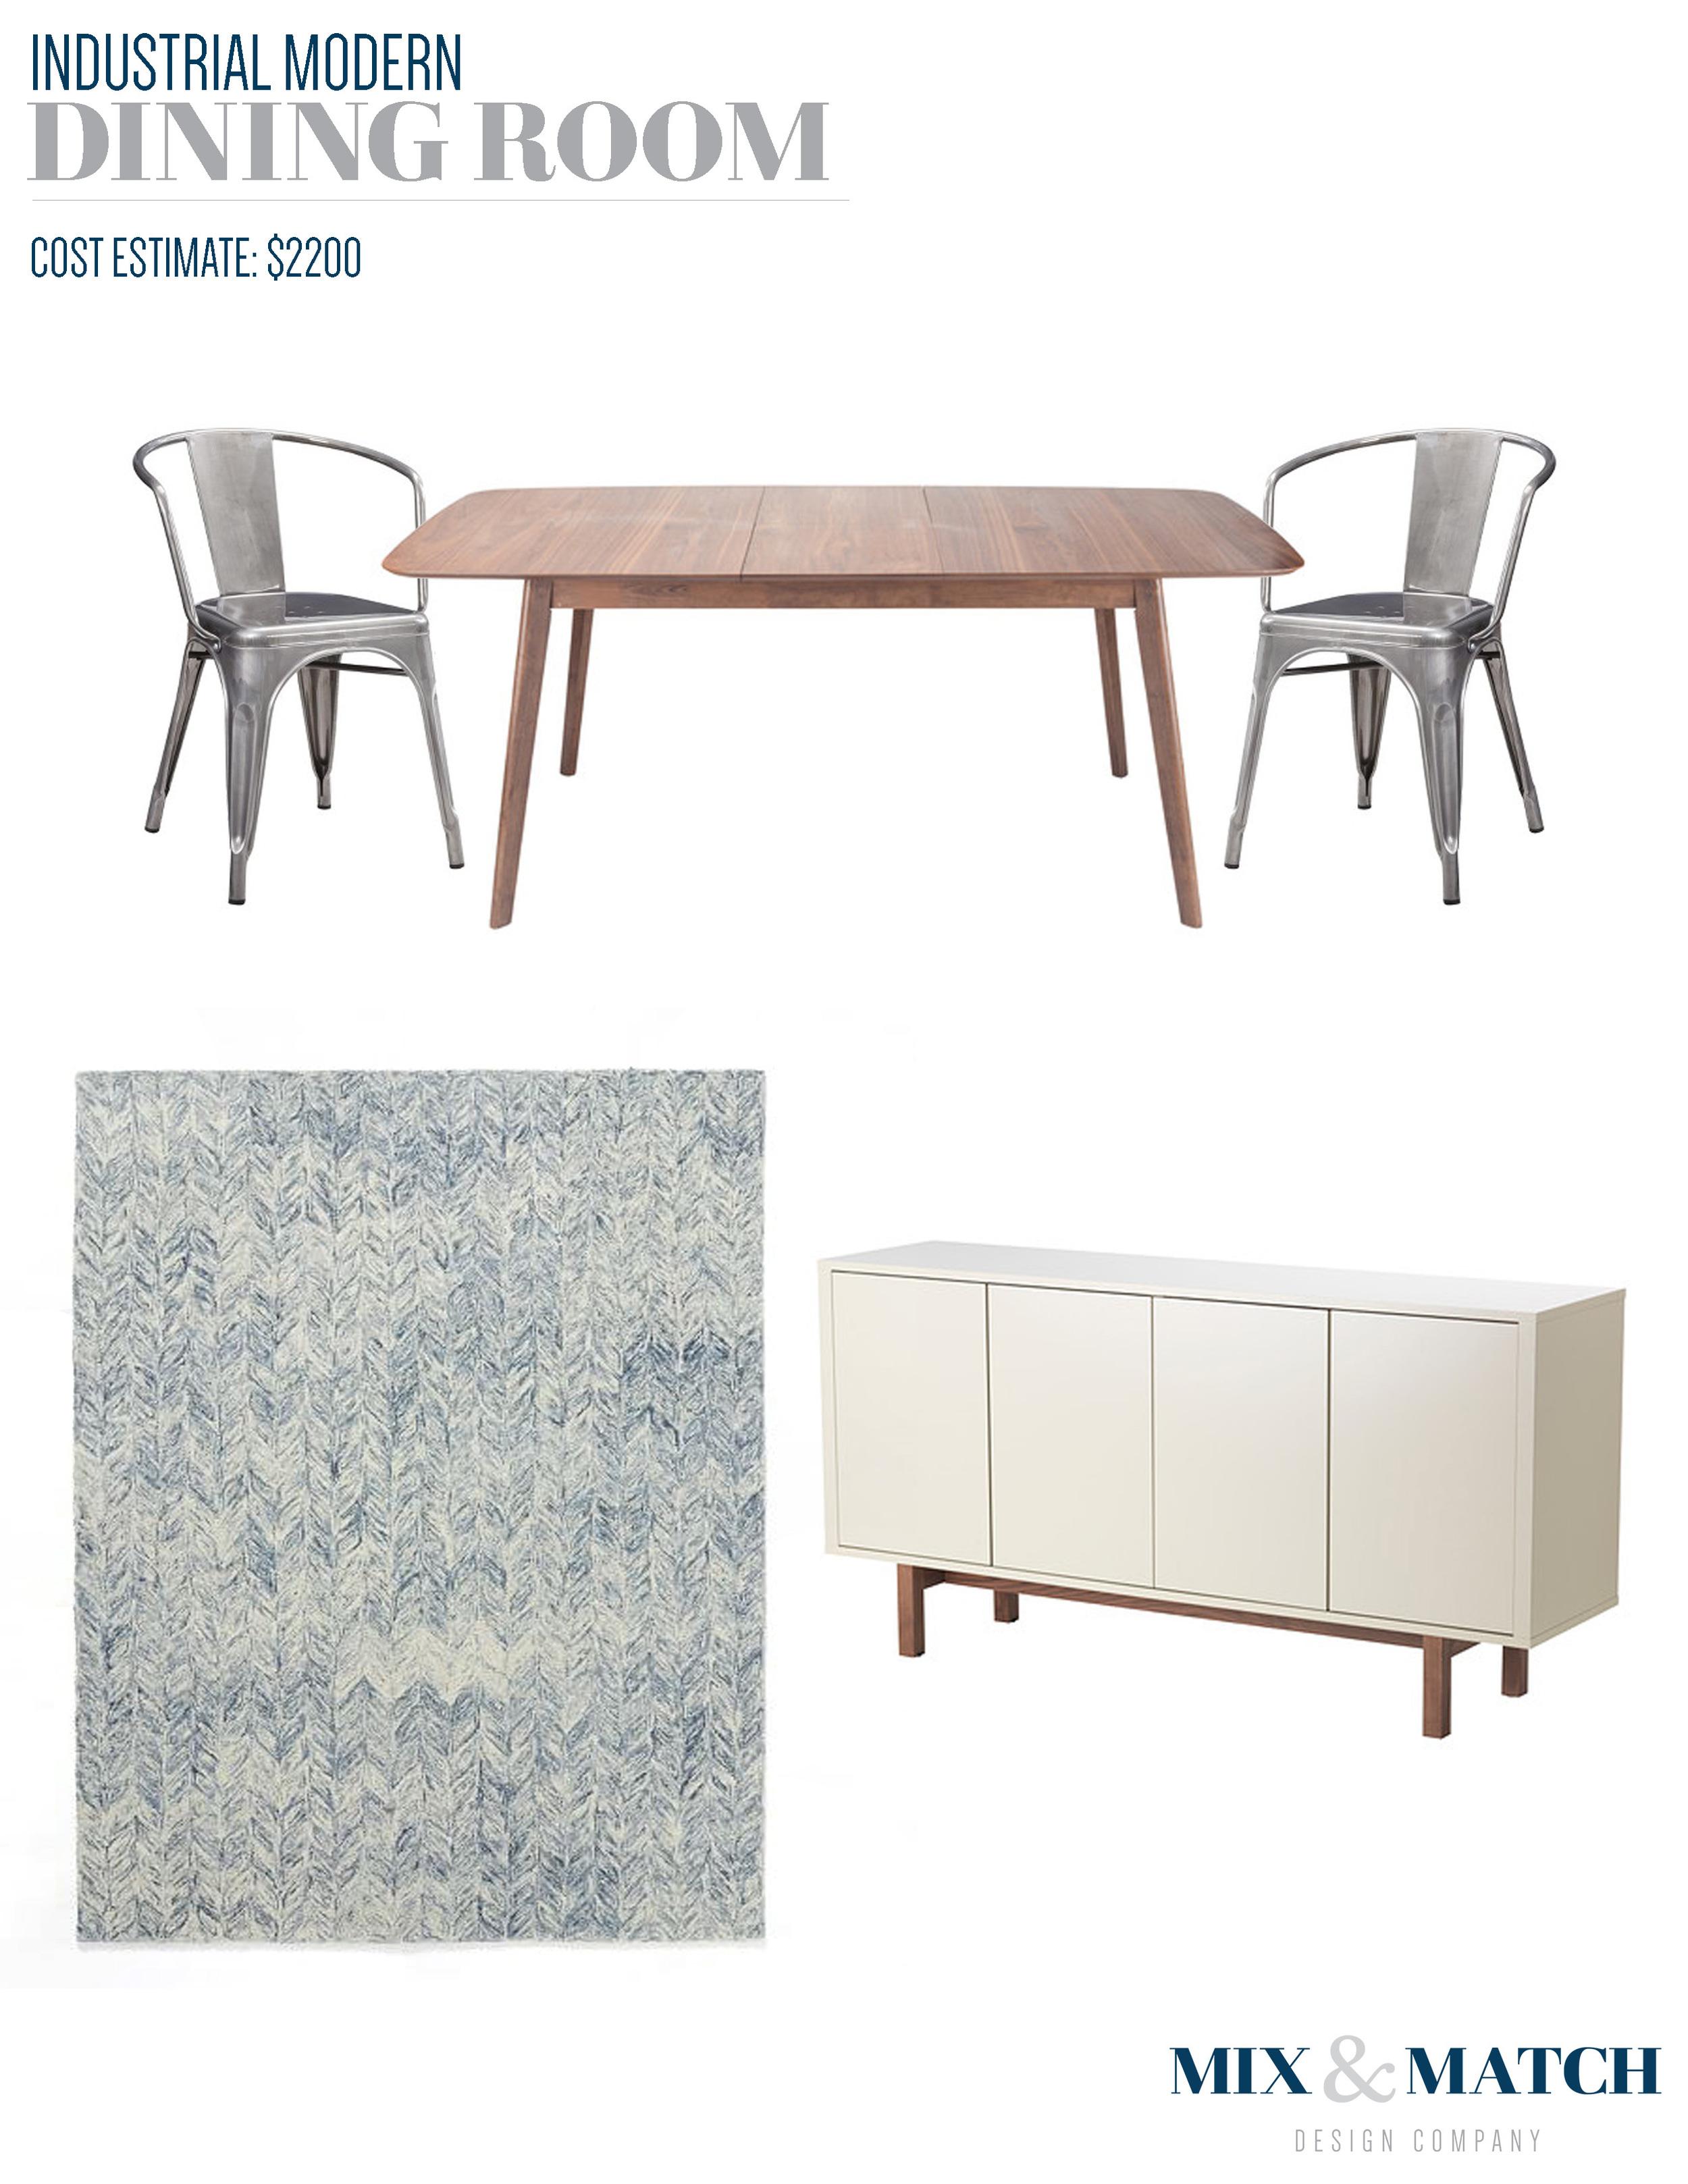 Industrial Modern Dining Room.jpg